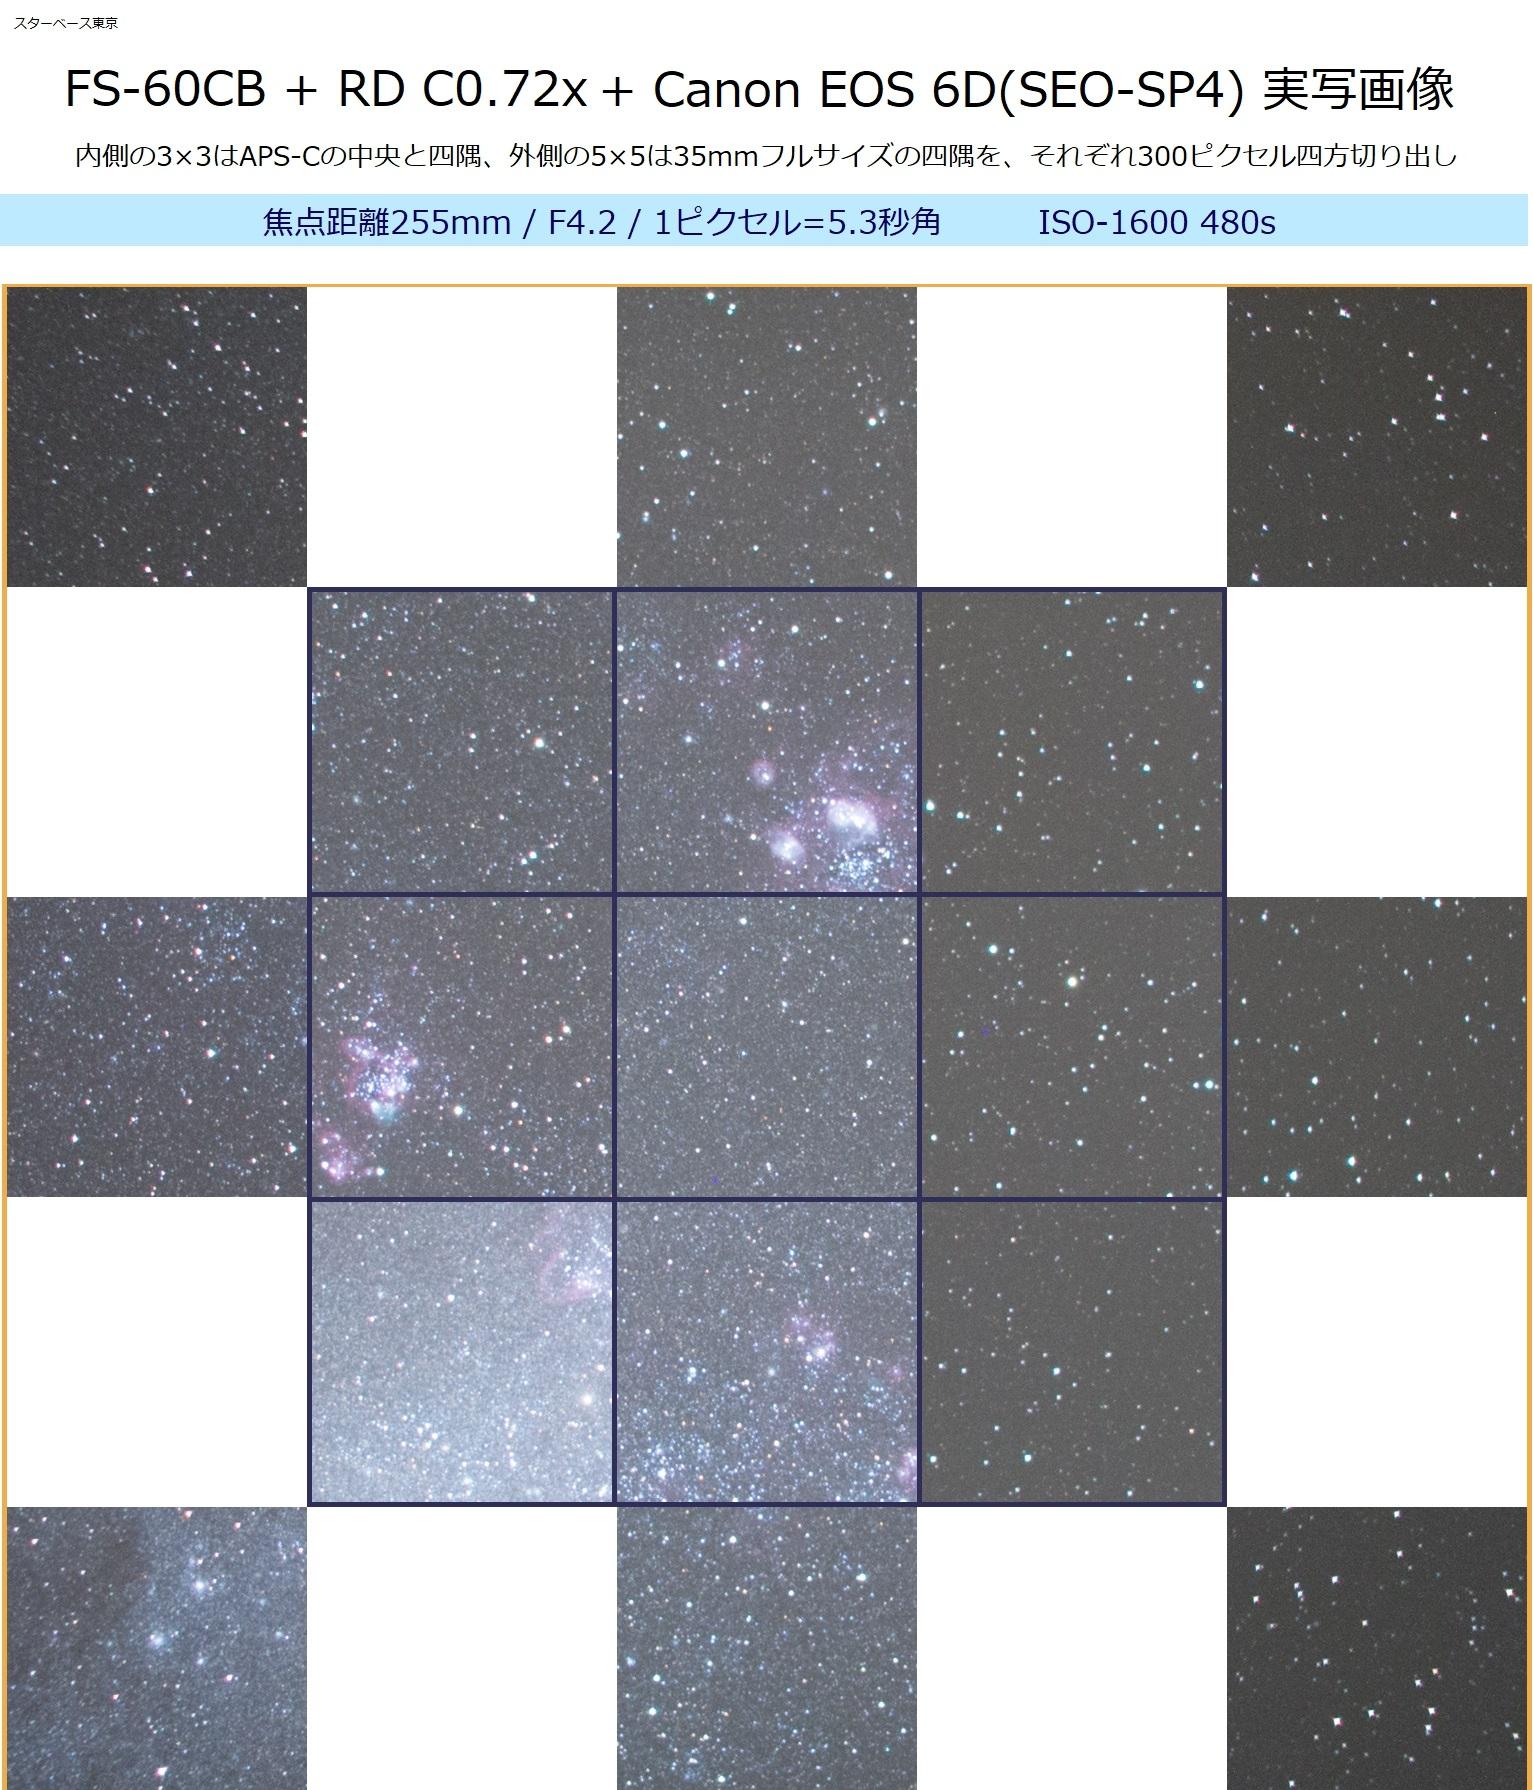 f:id:starbase:20180406205747j:plain